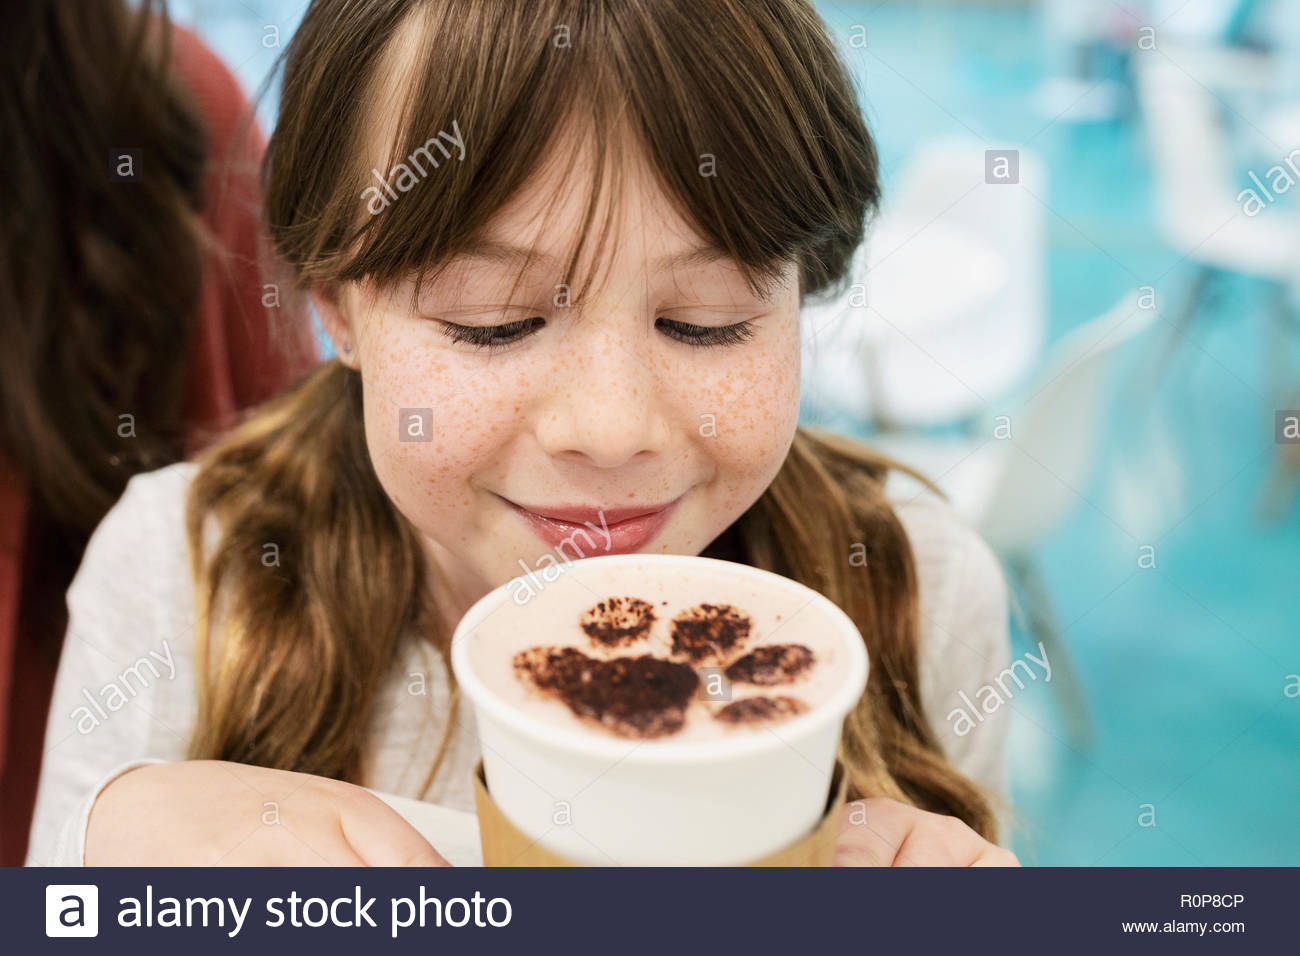 Curieux girl drinking hot chocolate avec mousse empreinte à cat cafe Photo Stock